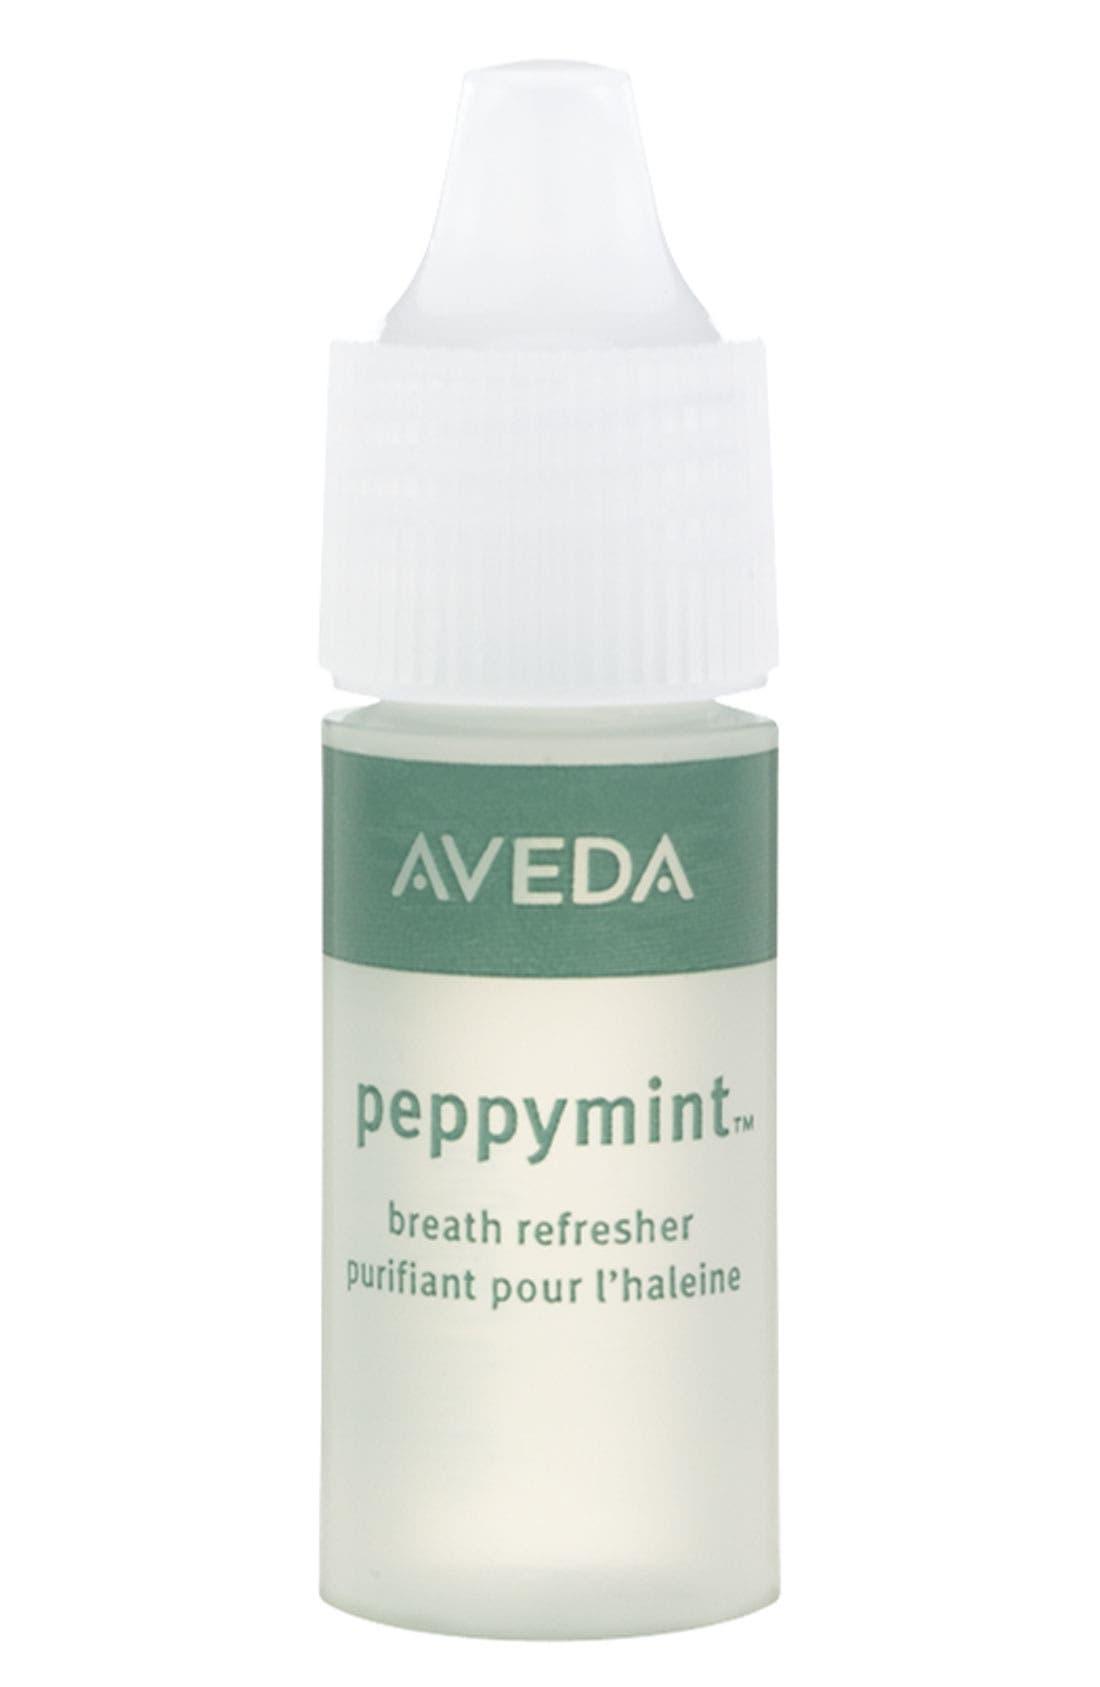 Aveda 'peppymint™' Breath Refresher